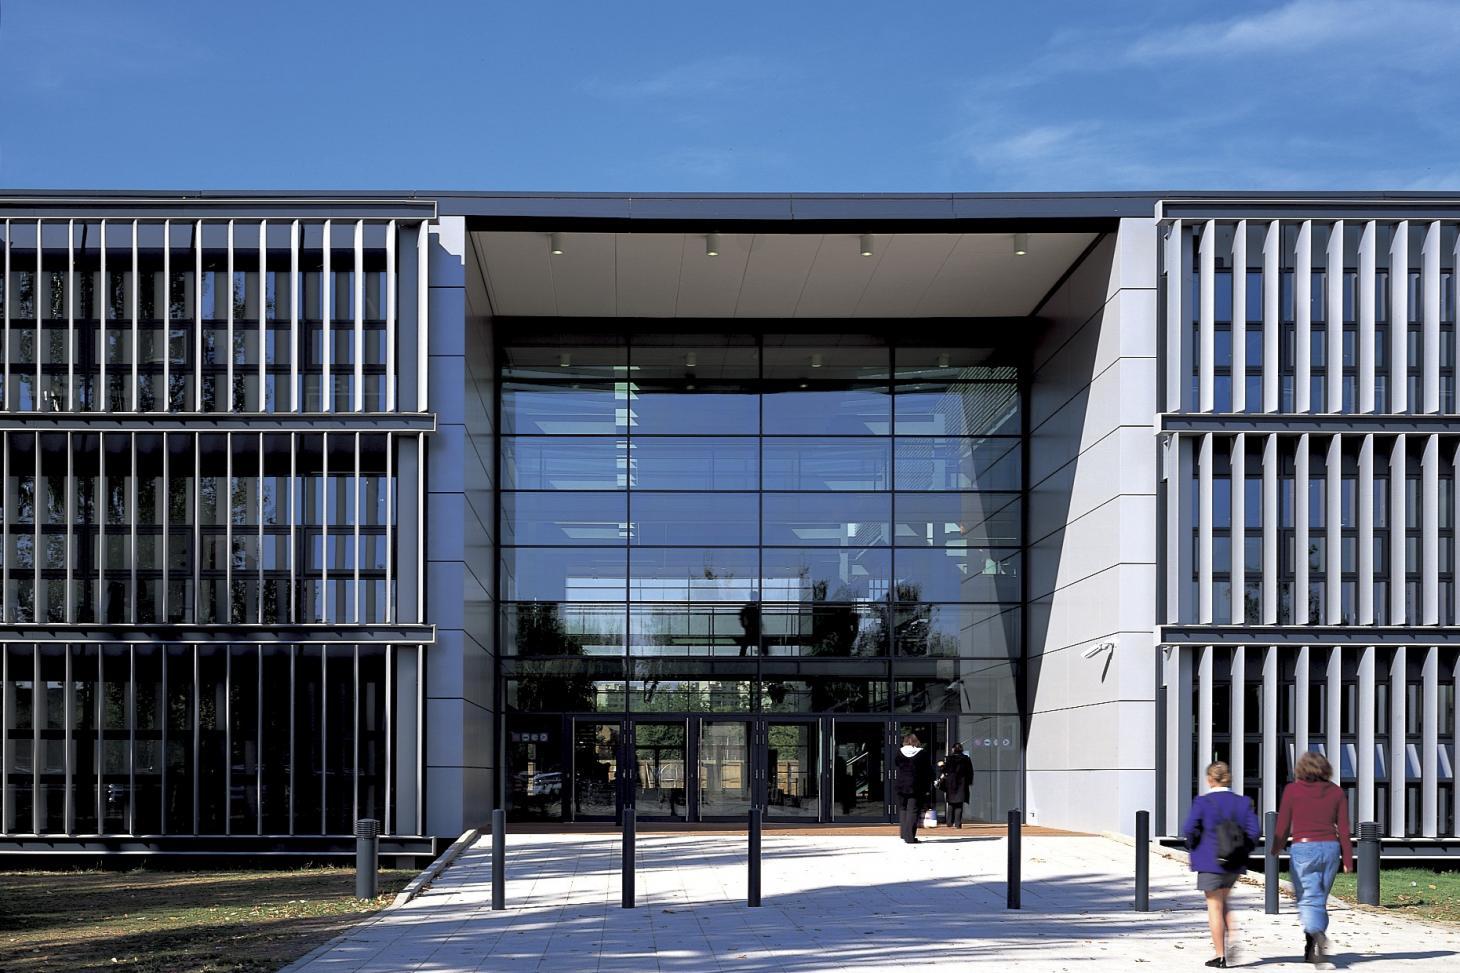 The Business Academy Bexley Indoor basketball court